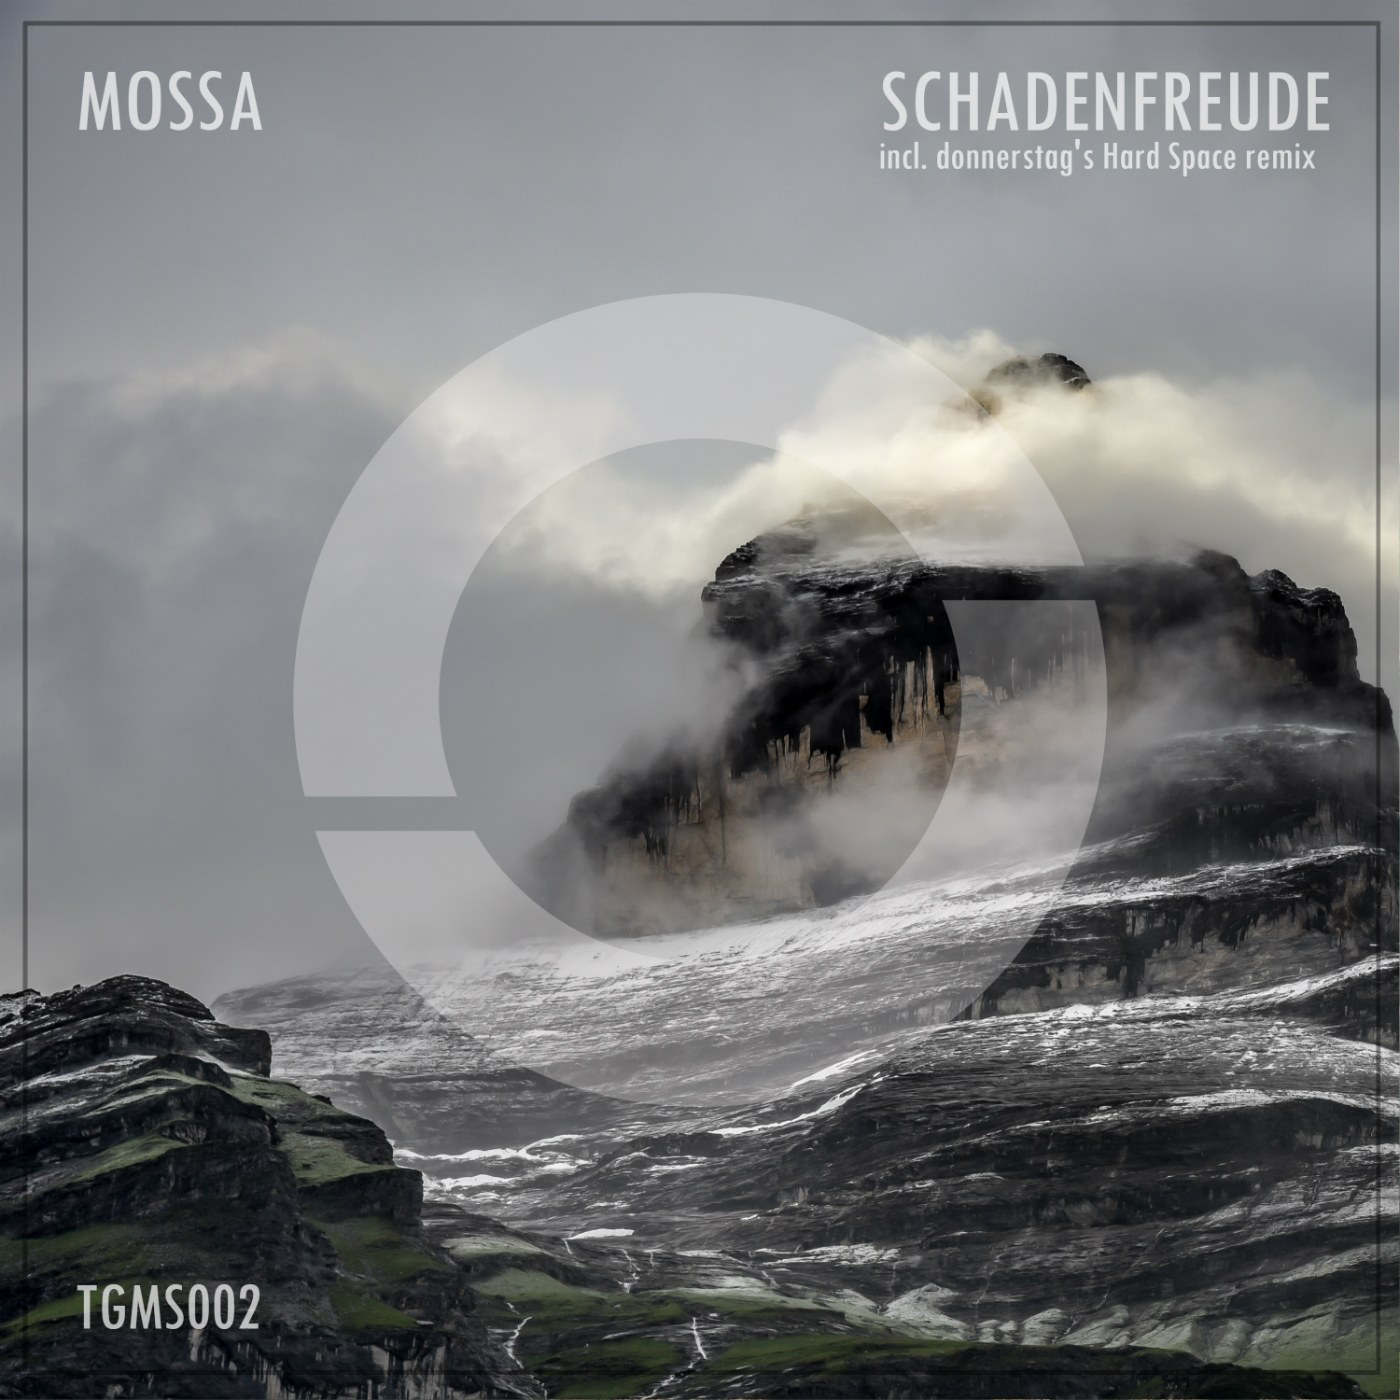 MOSSA - Schadenfreude